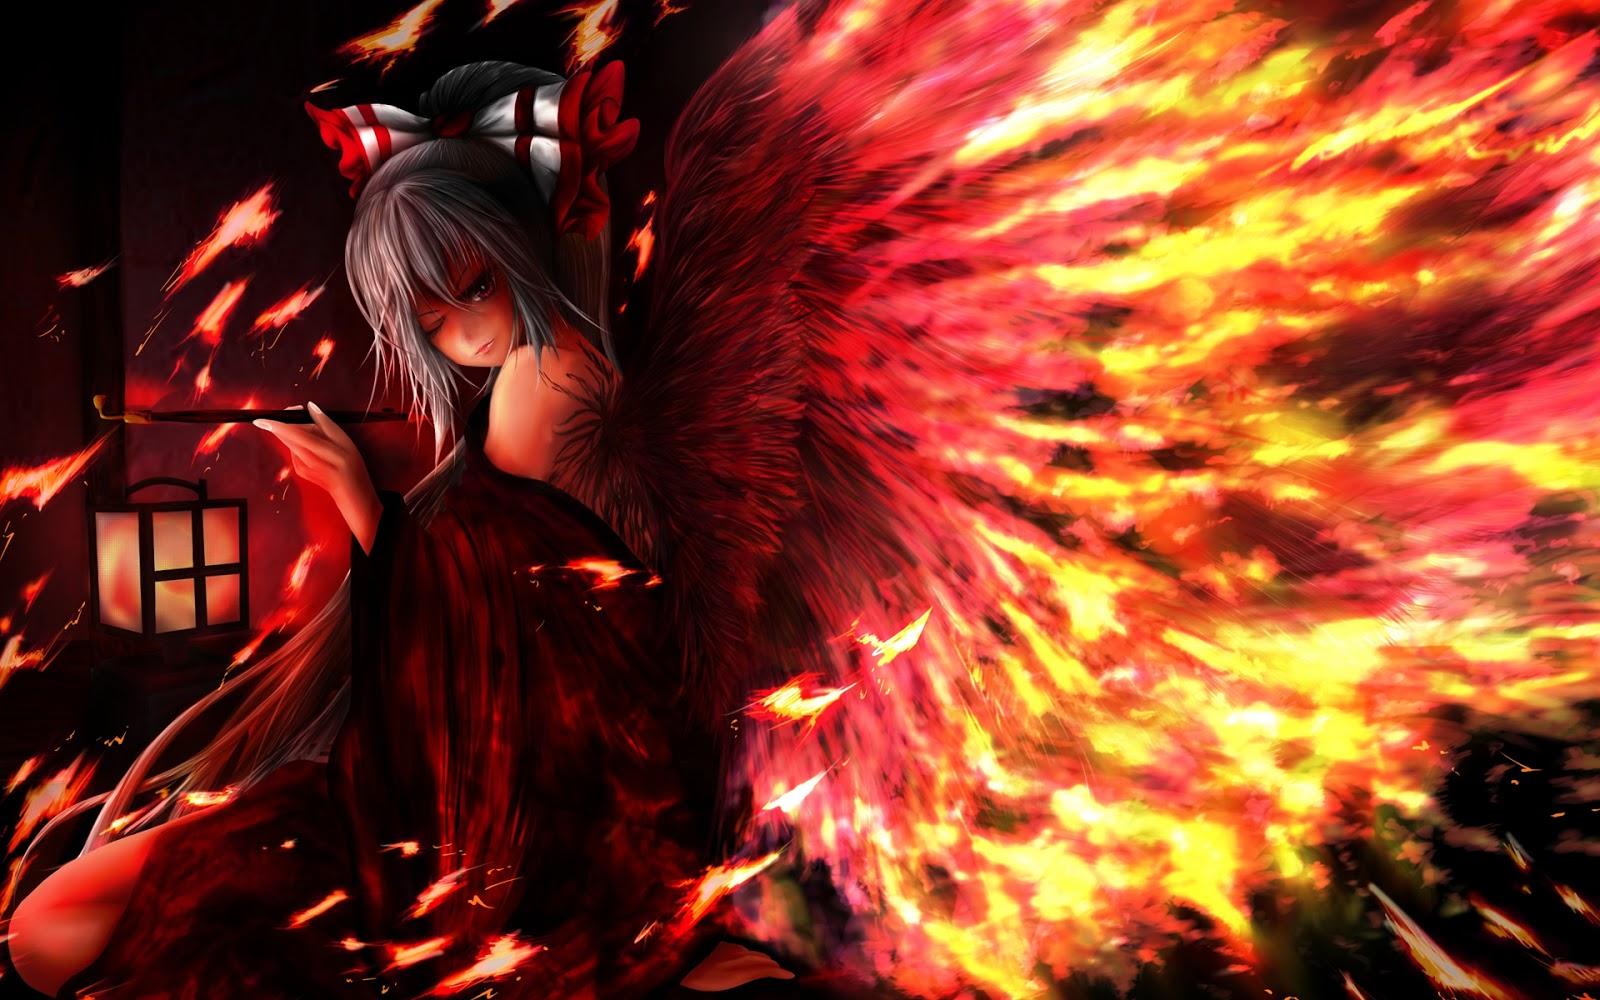 Anime Fire Girl Pics